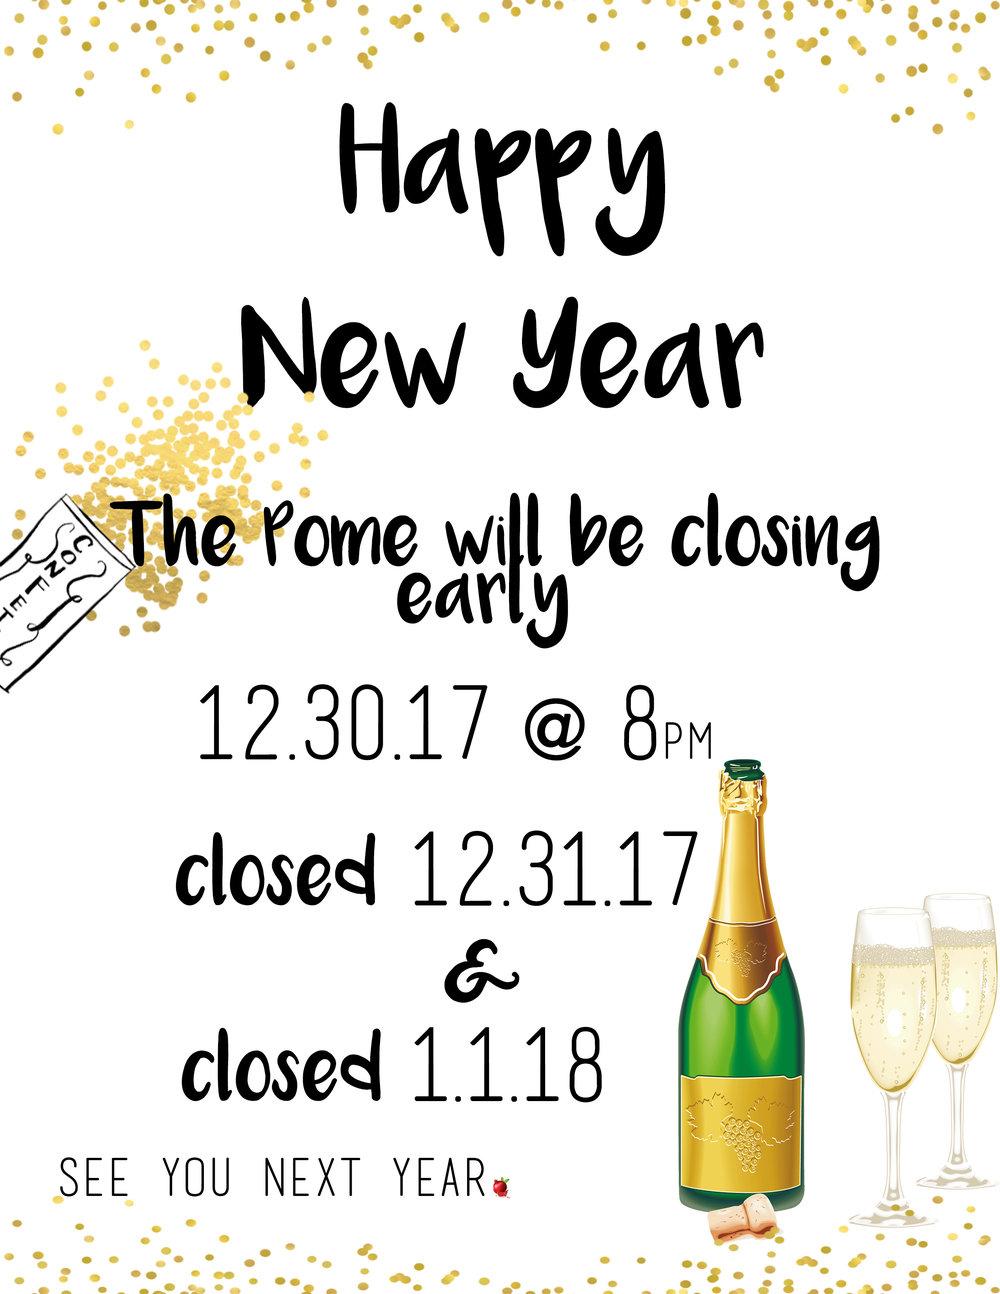 new year announced_Gary_2017.jpg